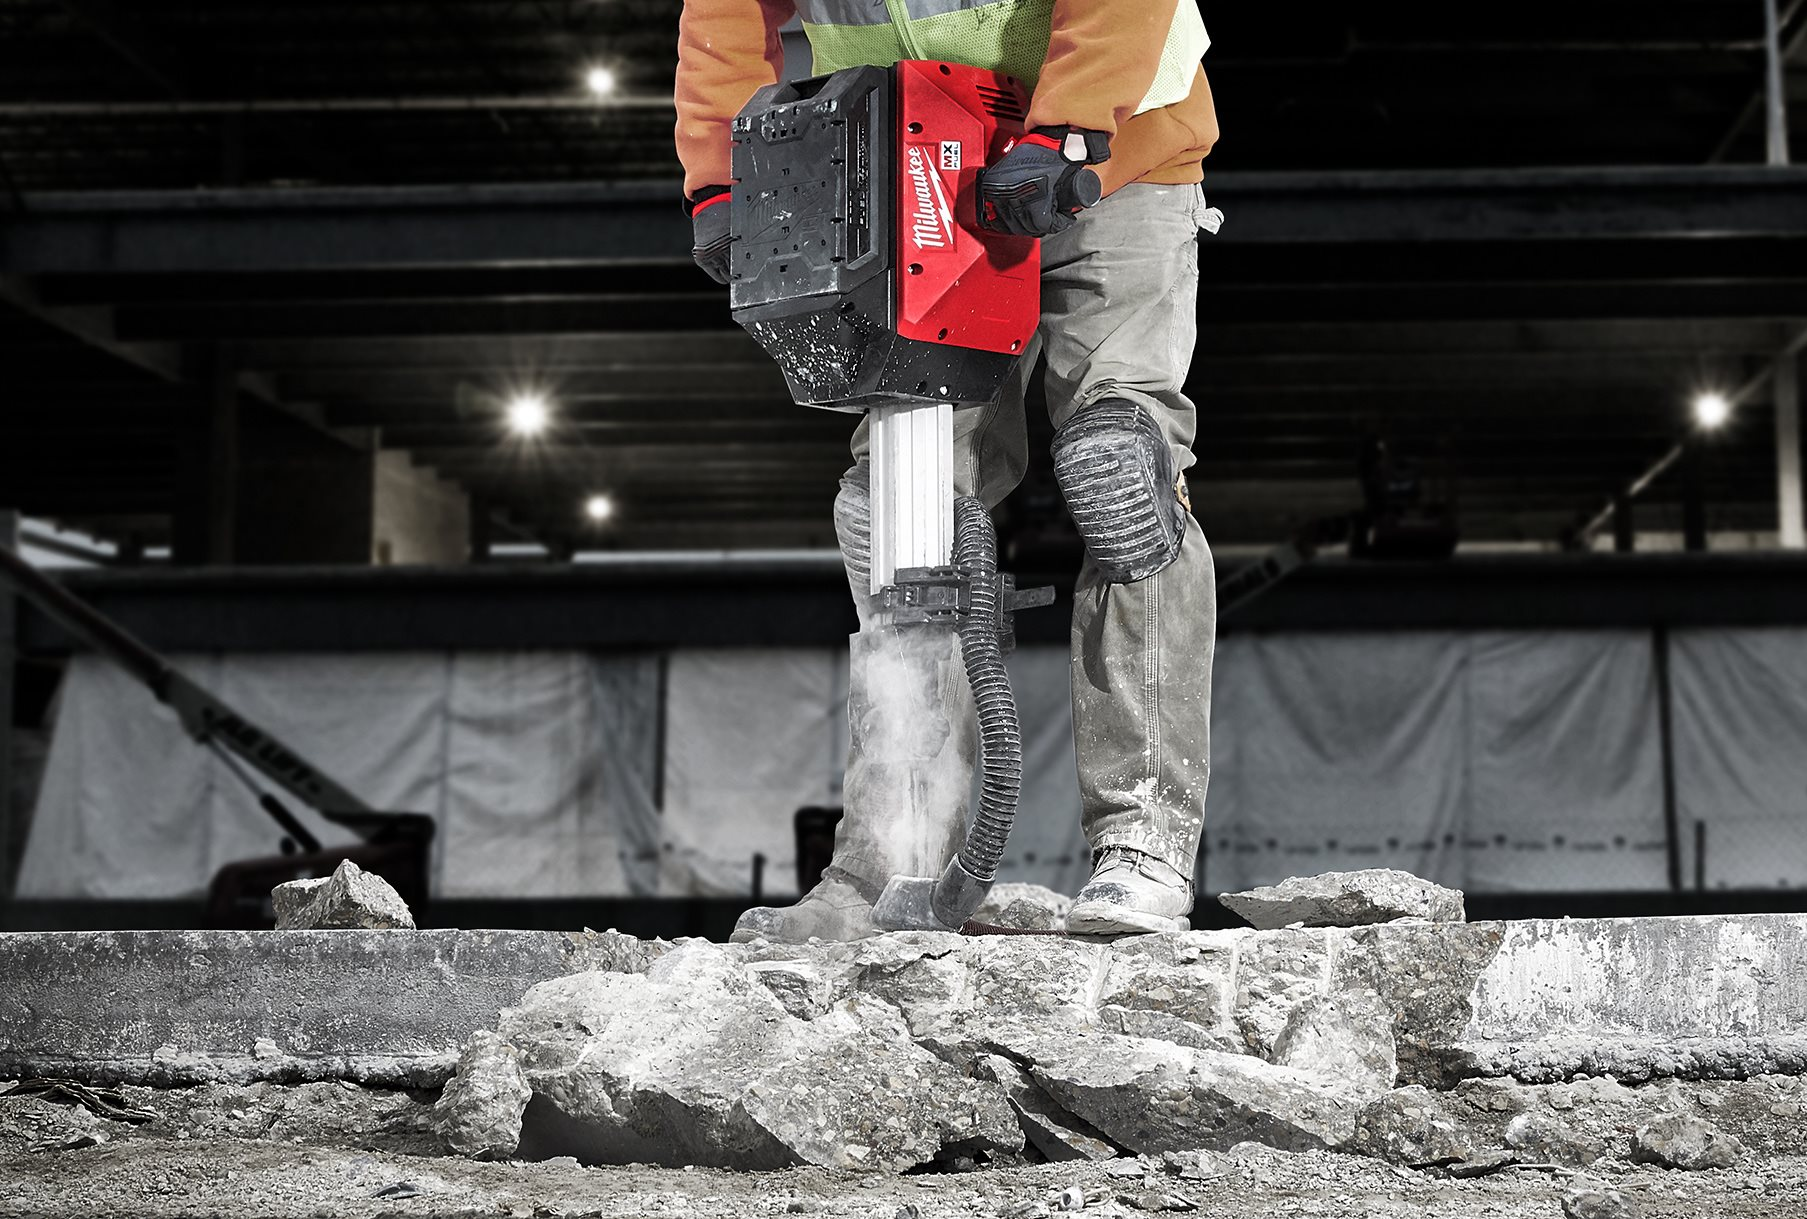 Akku-Abbruchhammer: Milwaukee kappt das Kabel